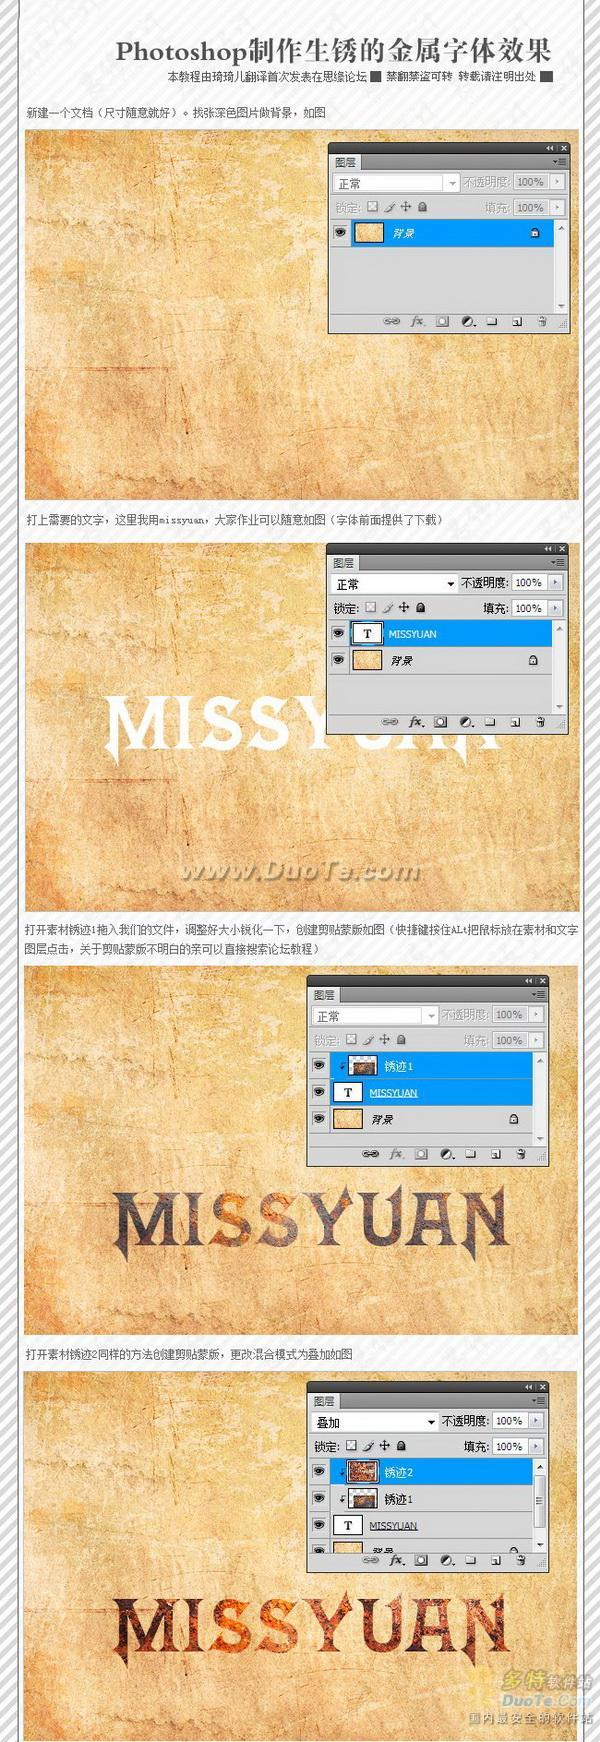 Photoshop 制作生锈的金属字体